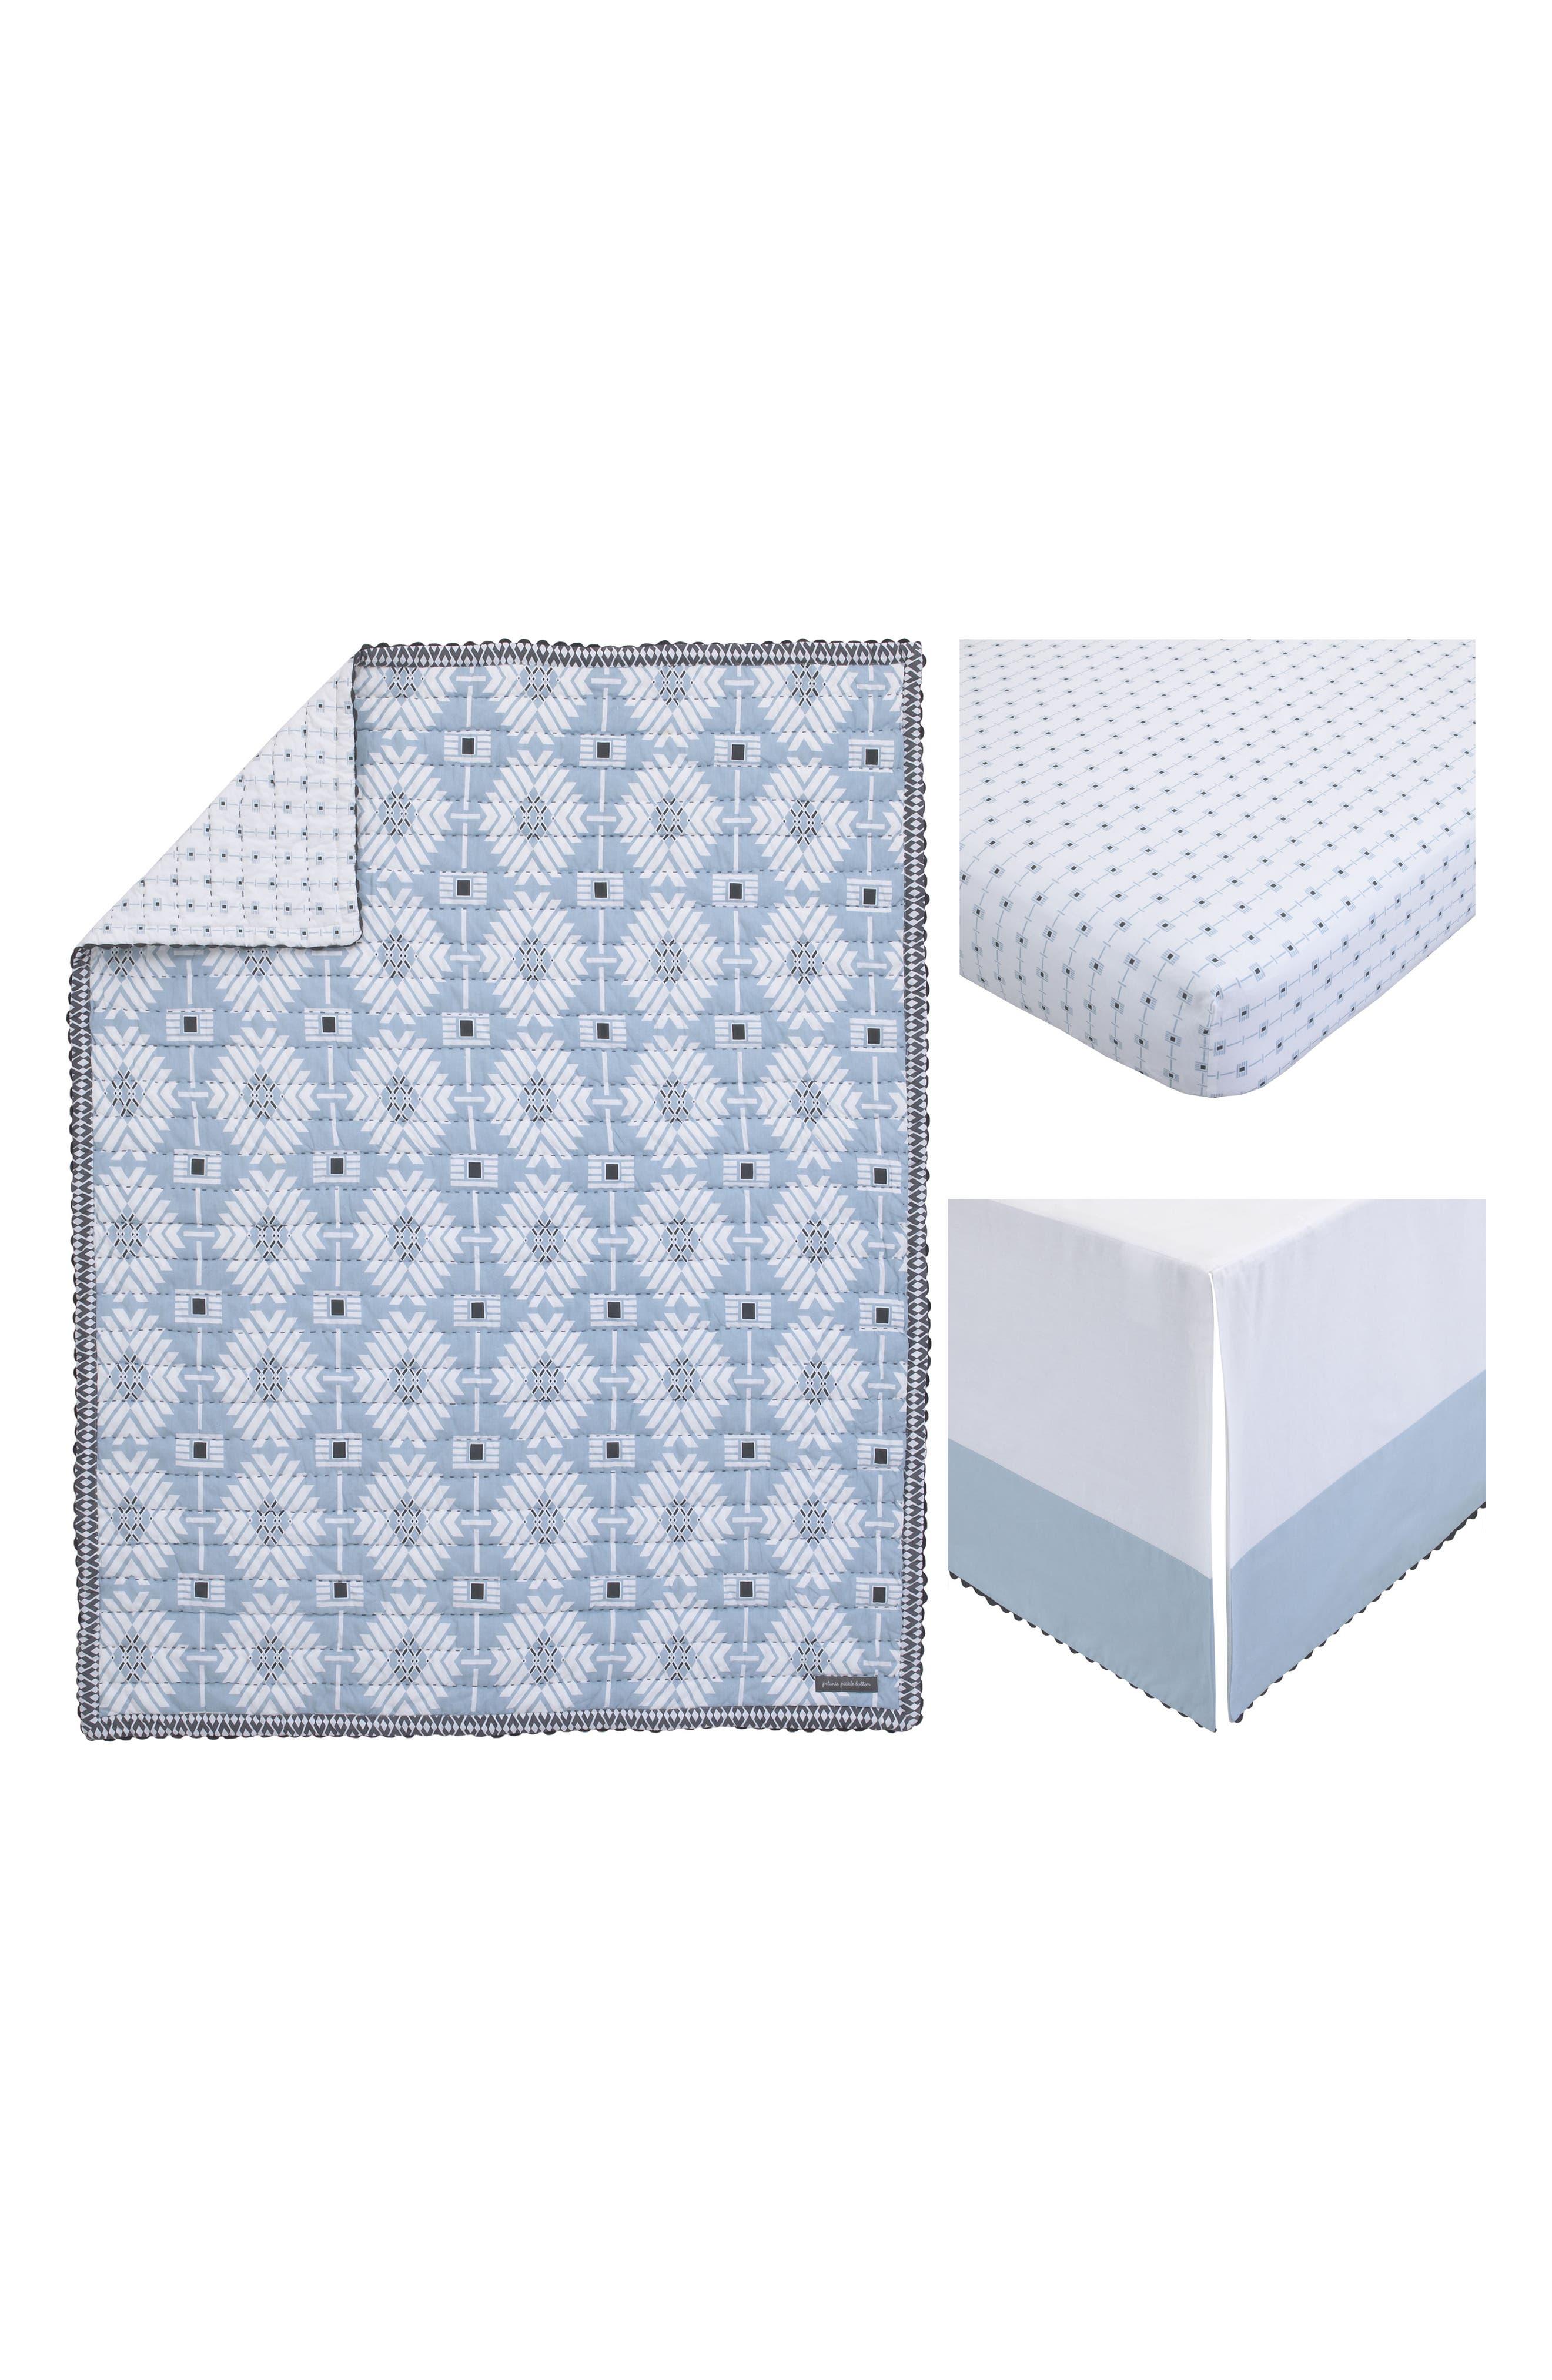 Southwest Skies 3-Piece Bedding Set,                             Alternate thumbnail 5, color,                             Light Blue